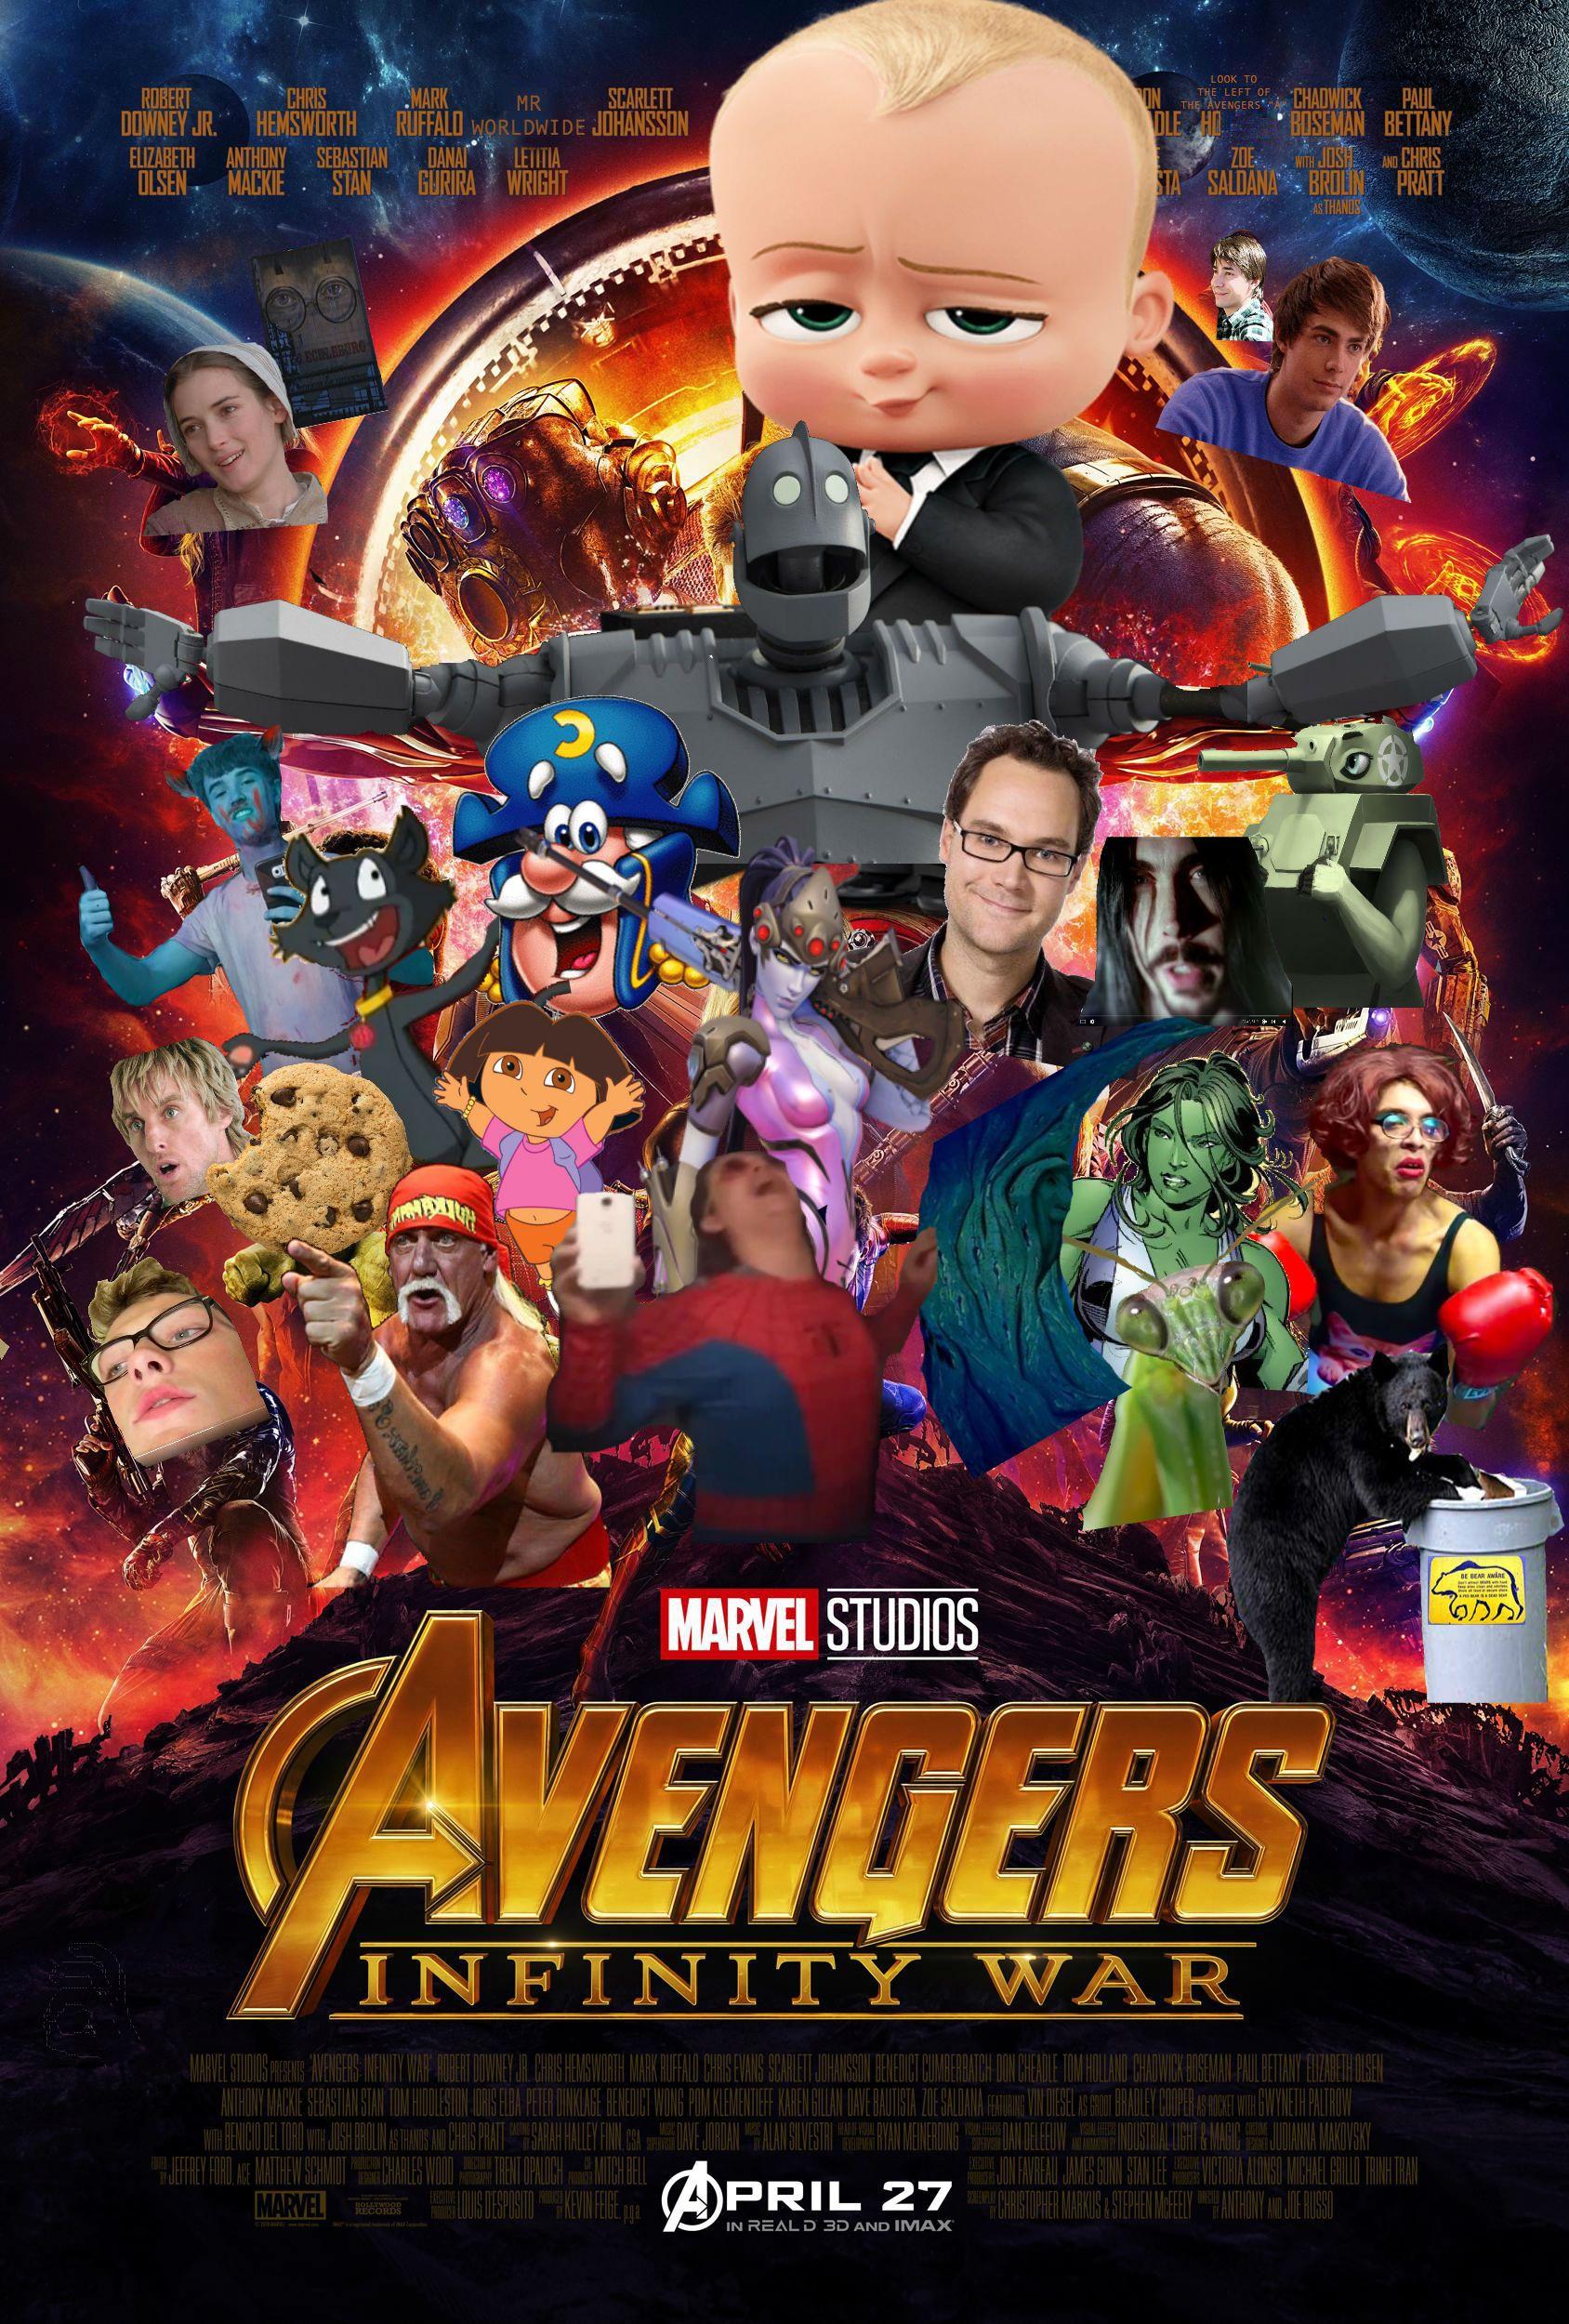 Higher Quality Avengers Infinity War Poster Avengers Funny Marvel Posters Avengers